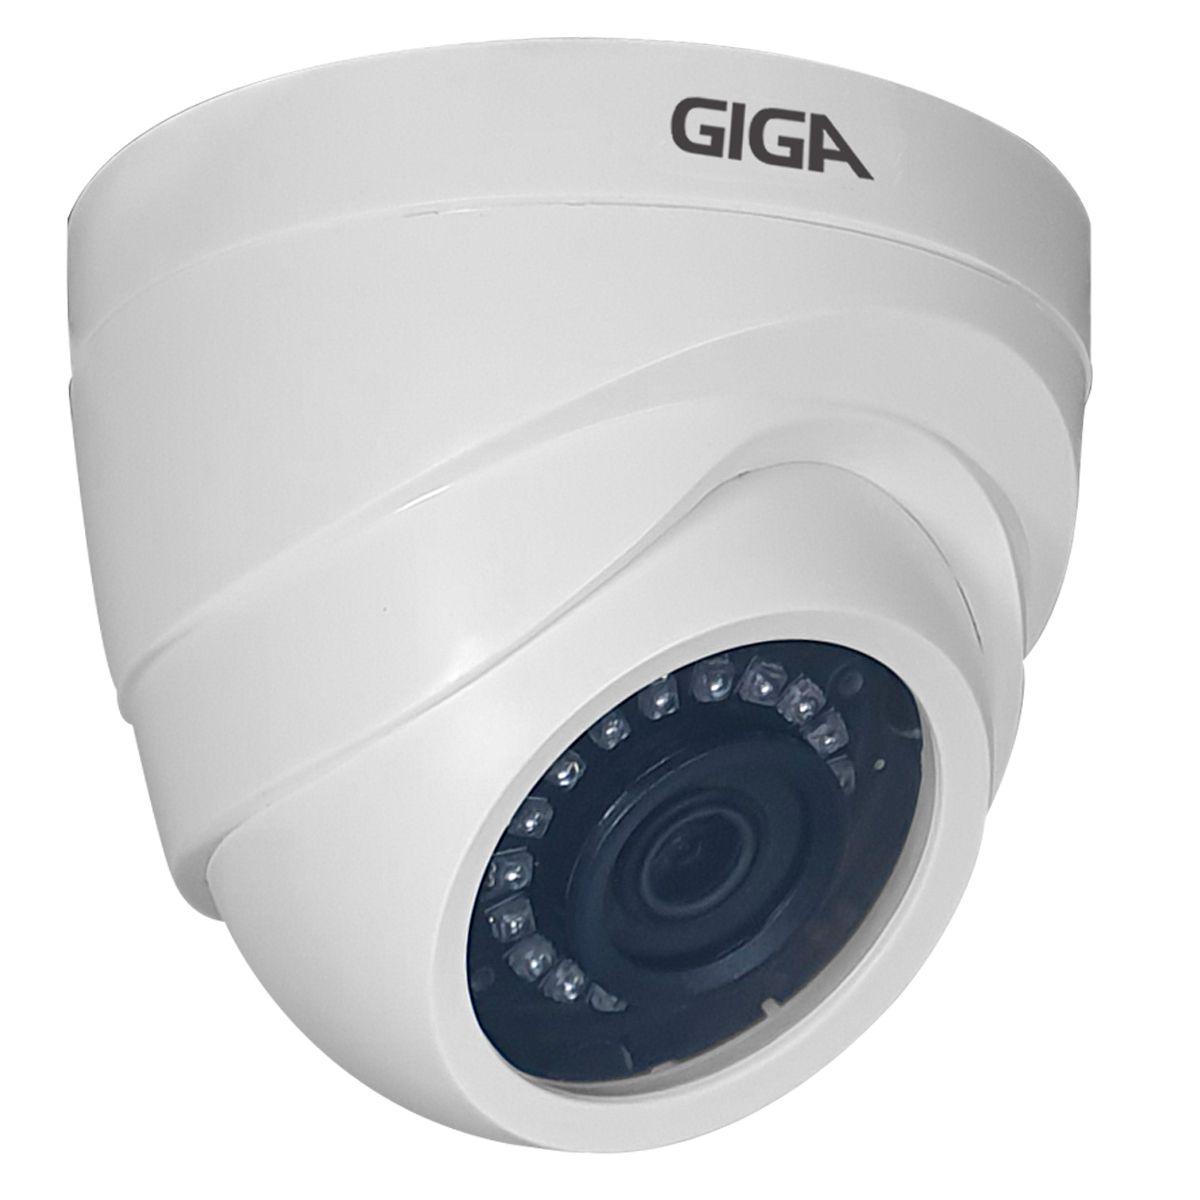 Kit Orion Giga Security 10 Câmeras HD 720p GS0019 + DVR Full HD + Acessórios  - Tudo Forte